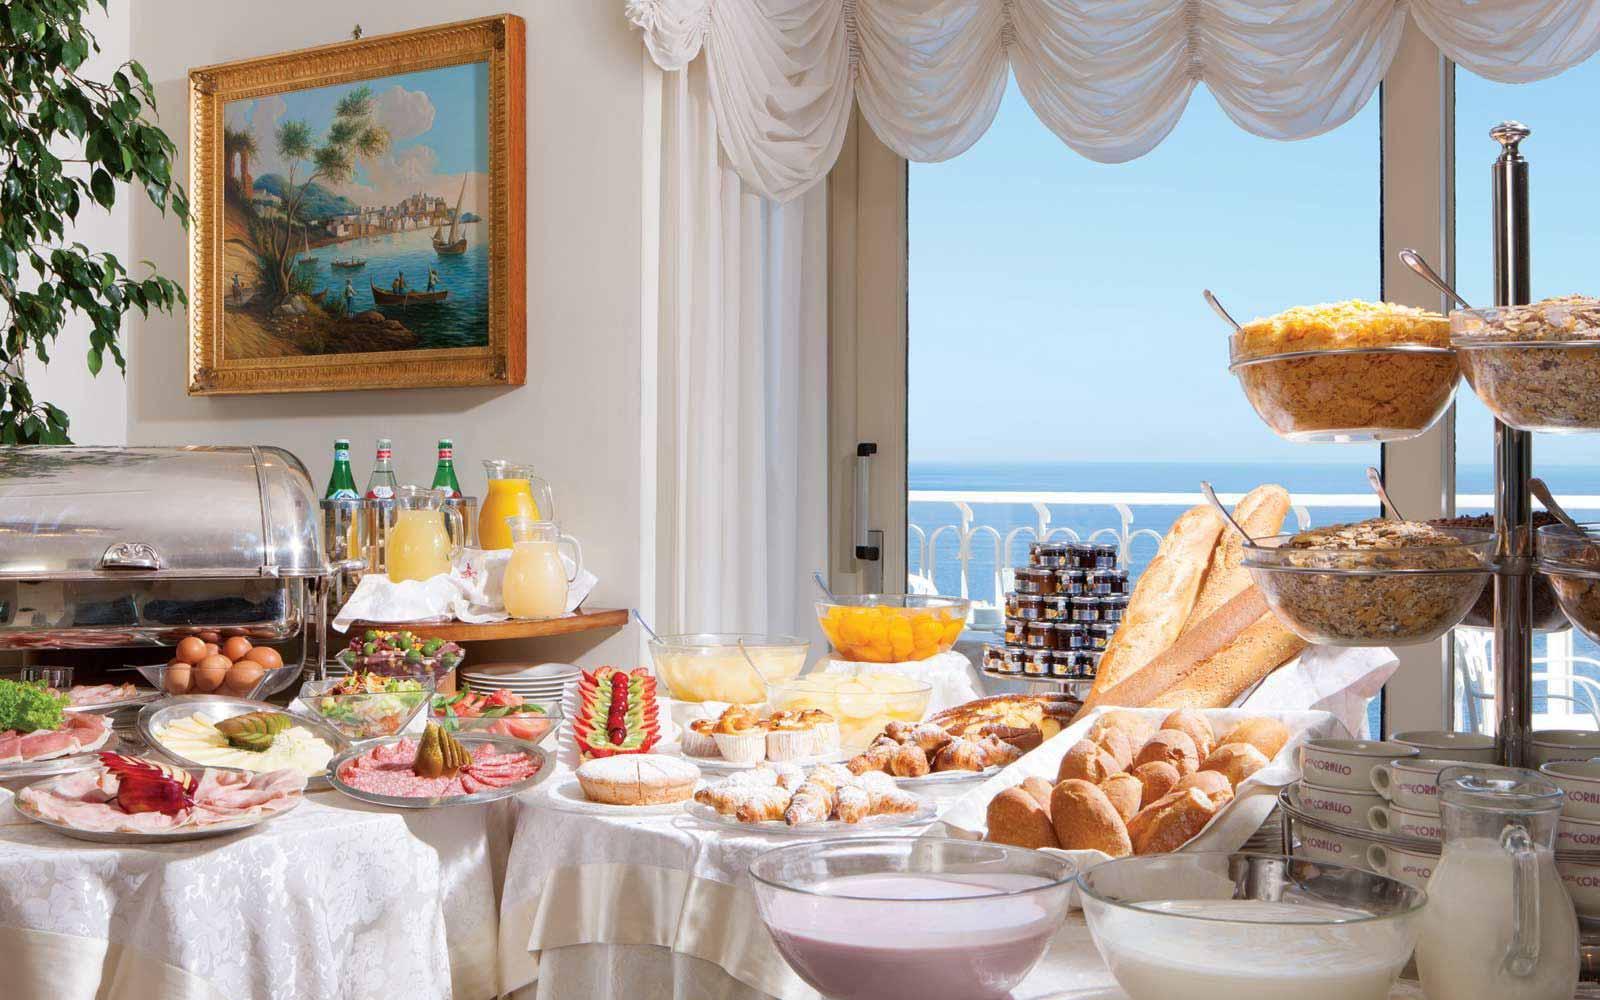 Buffet breakfast at Hotel Corallo